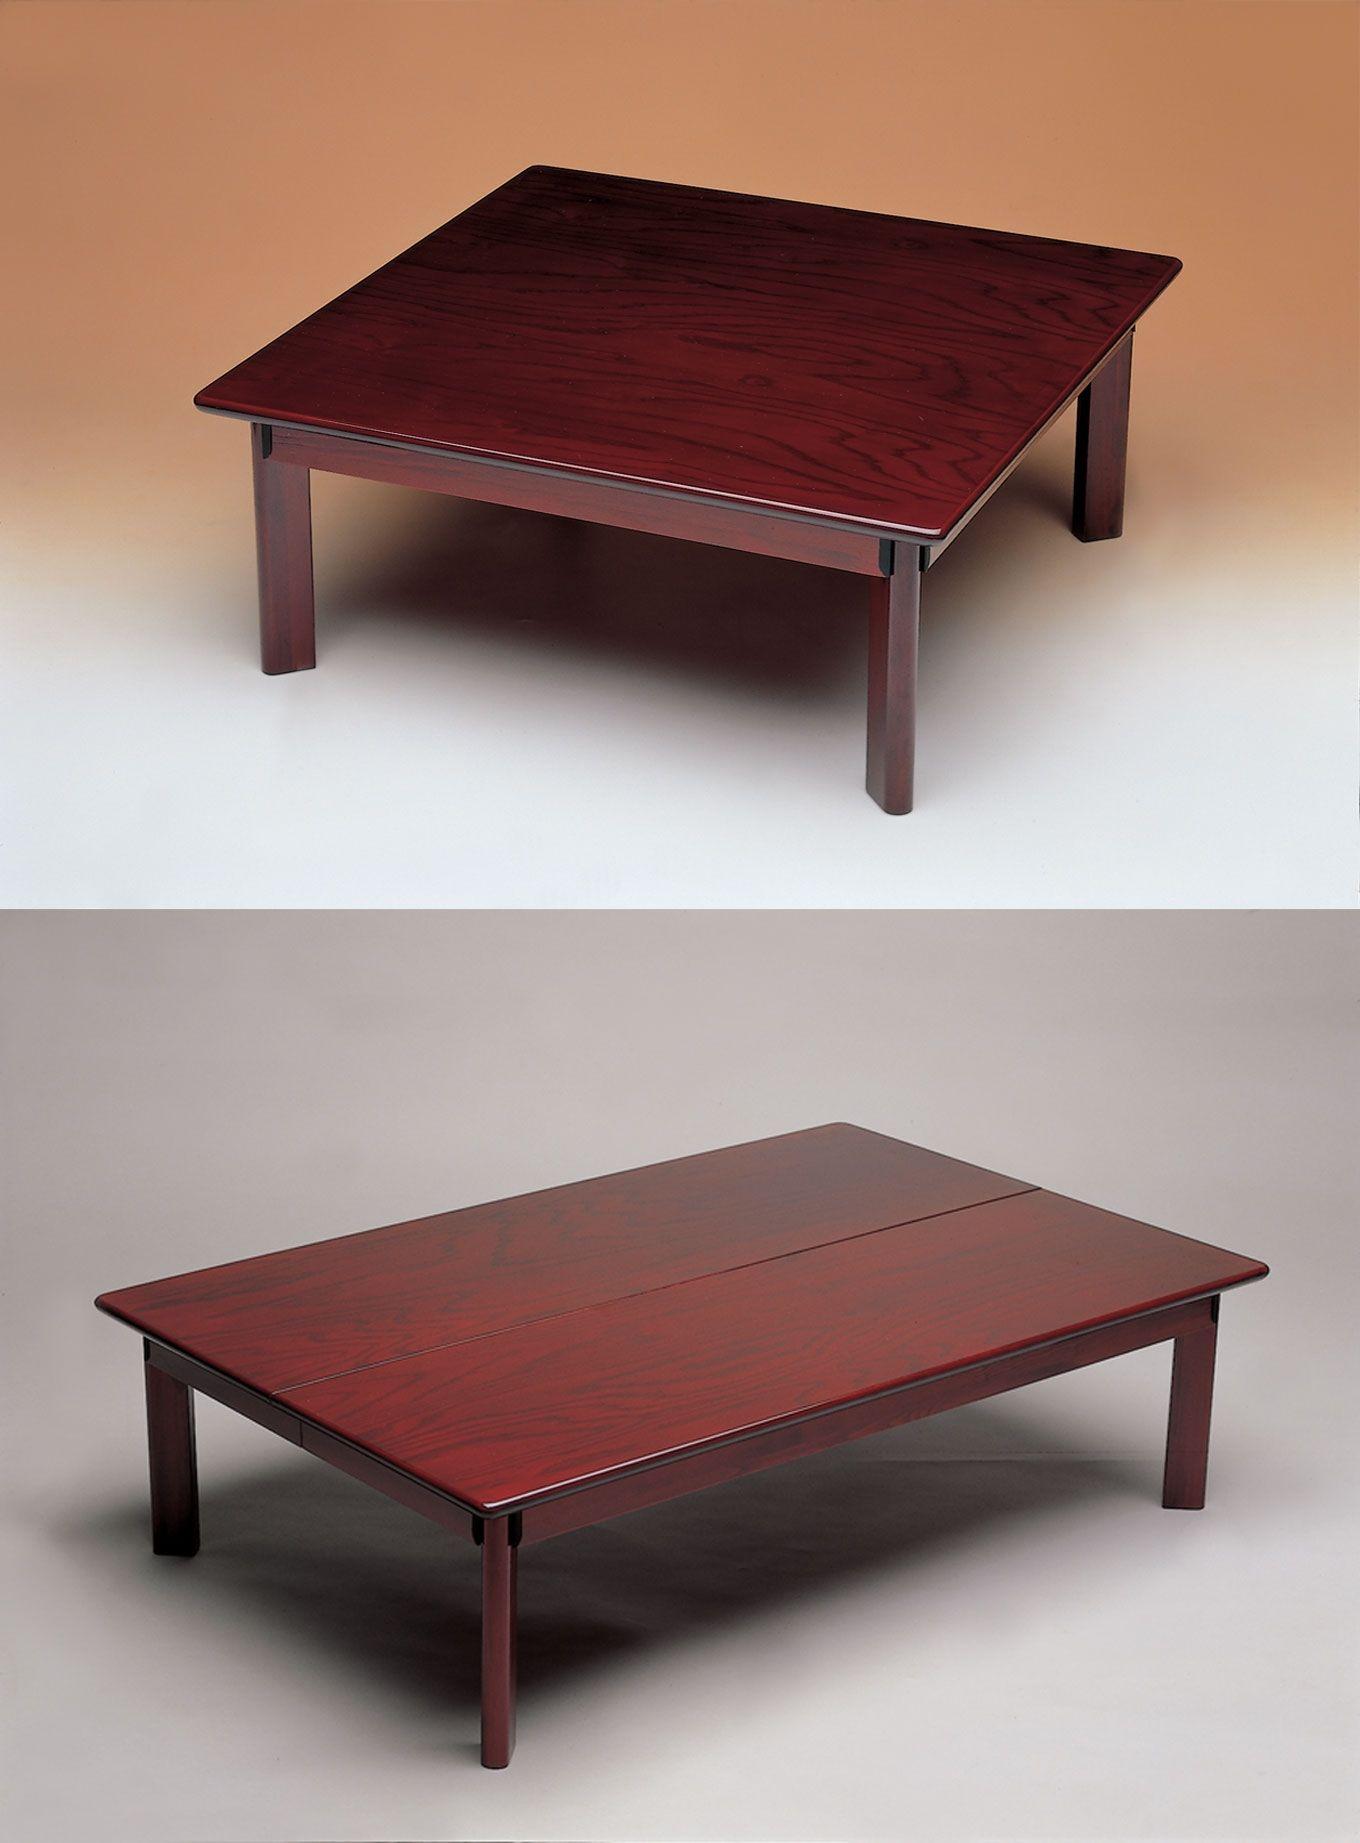 Korean Folding Dining Table Folding Dining Table Dining Table